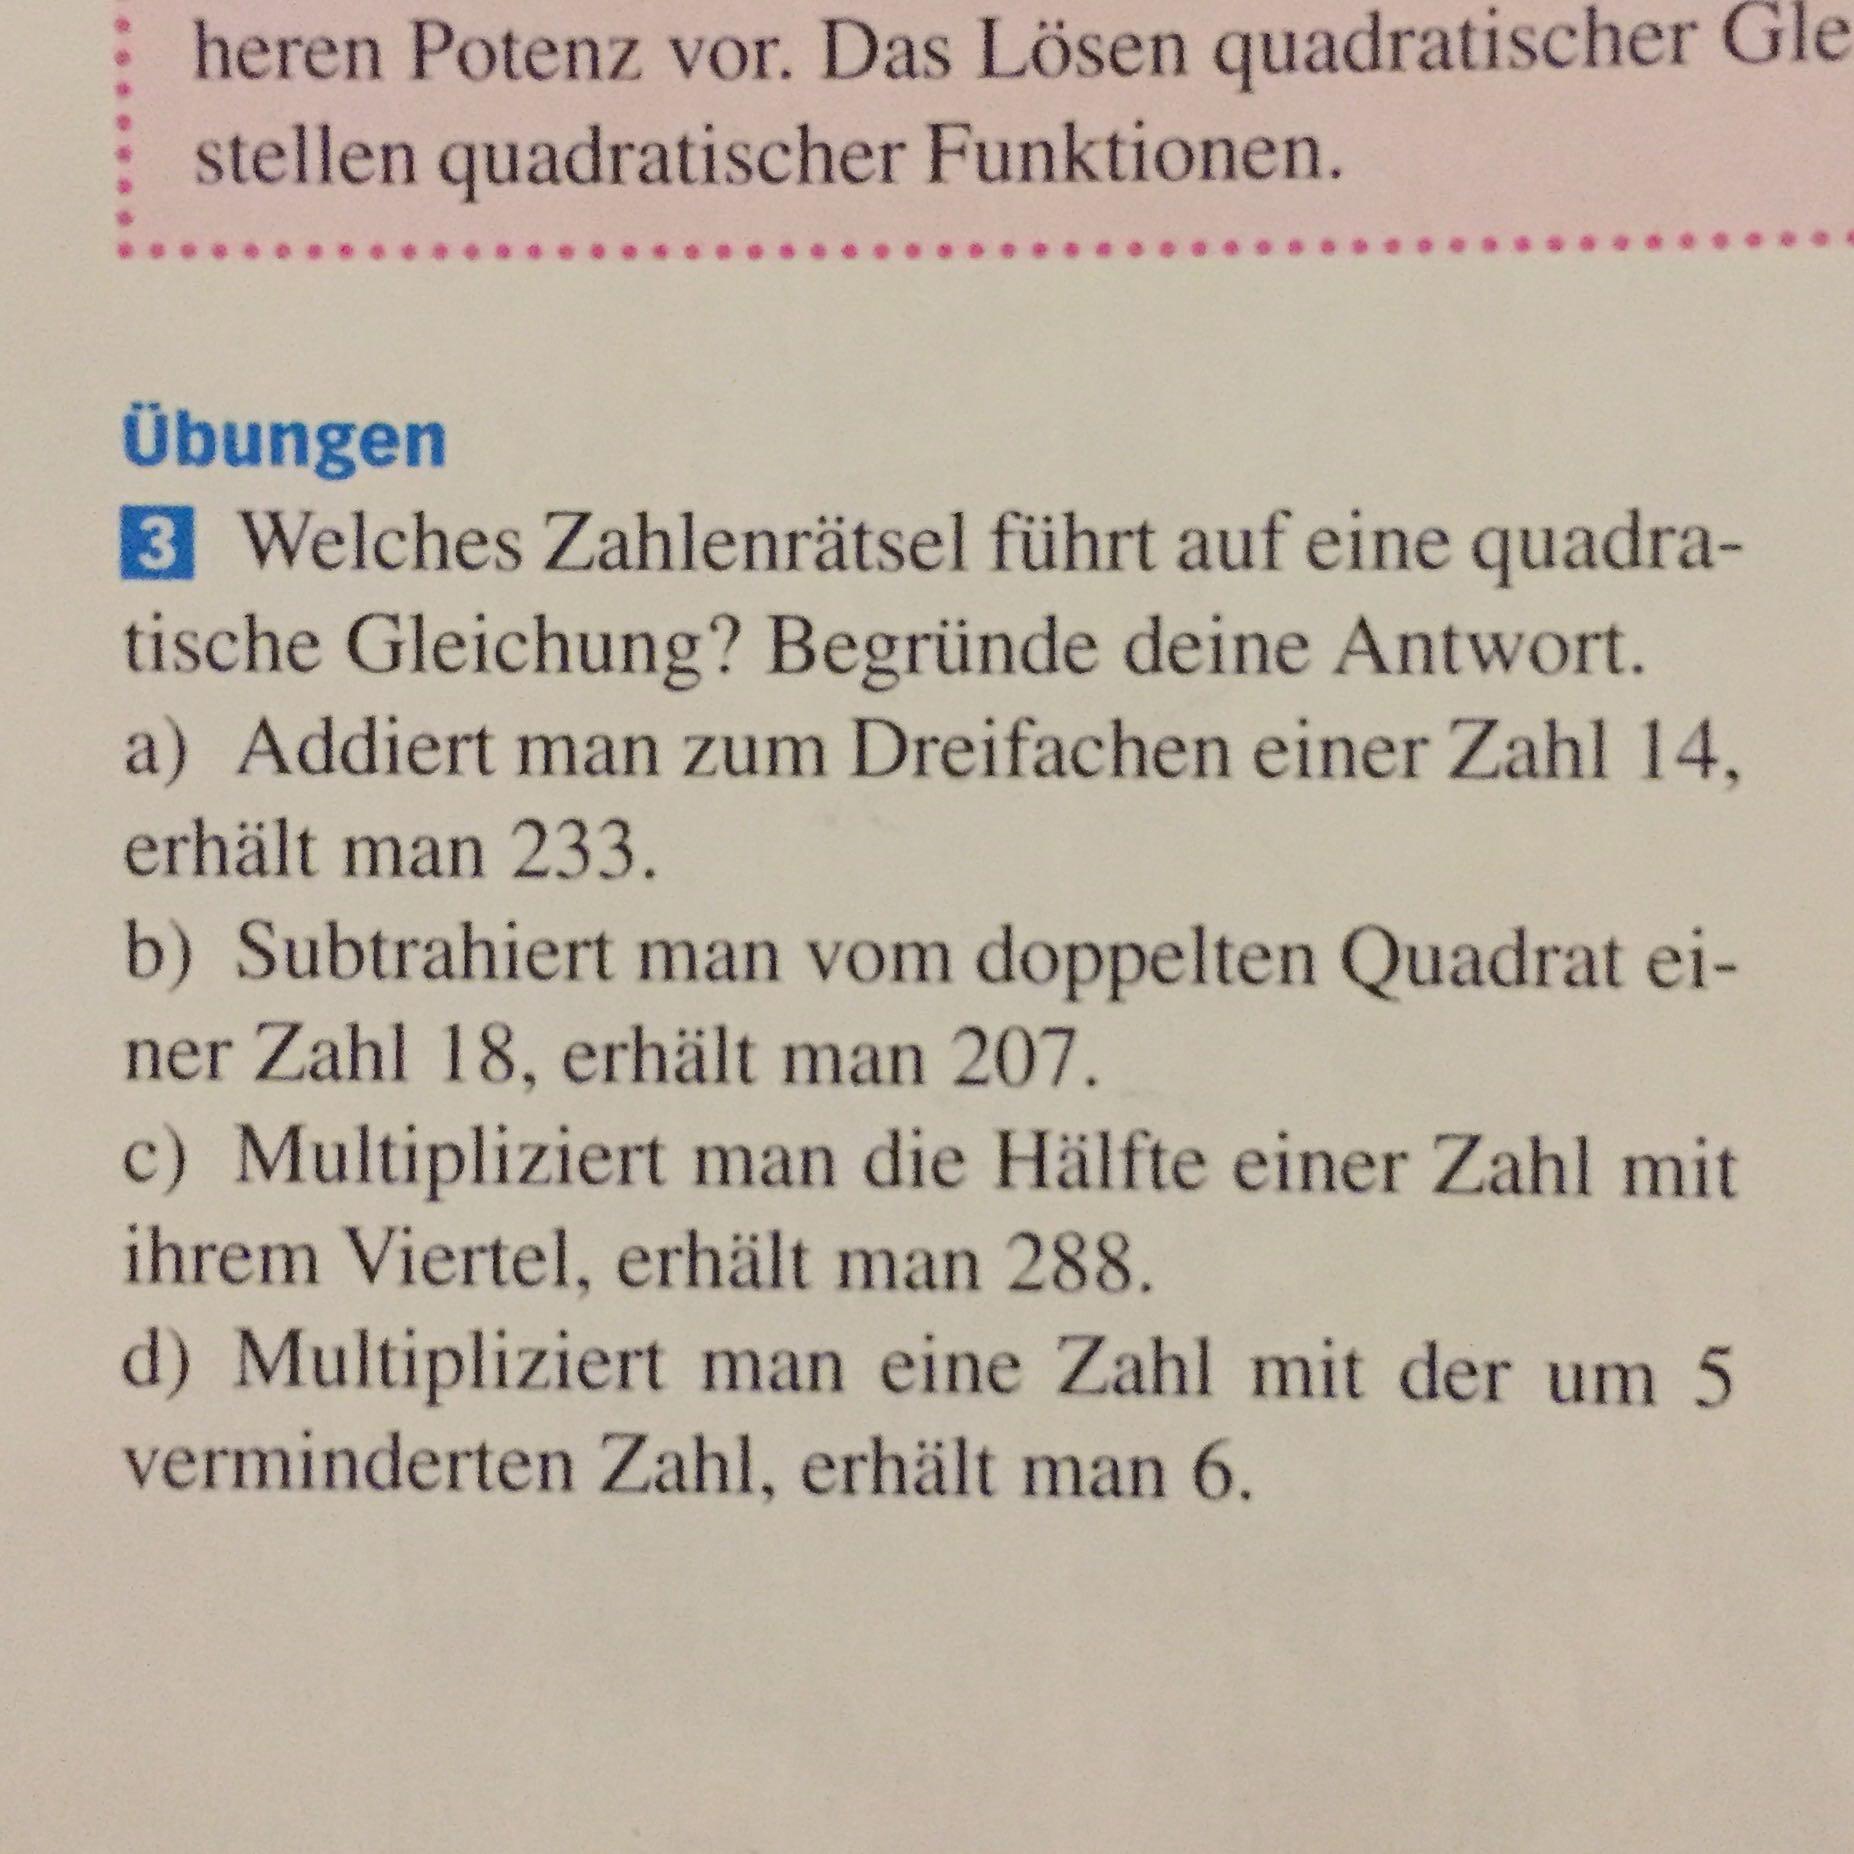 Großartig Kumon Mathe Arbeitsblatt Kostenlos Herunterladen Fotos ...